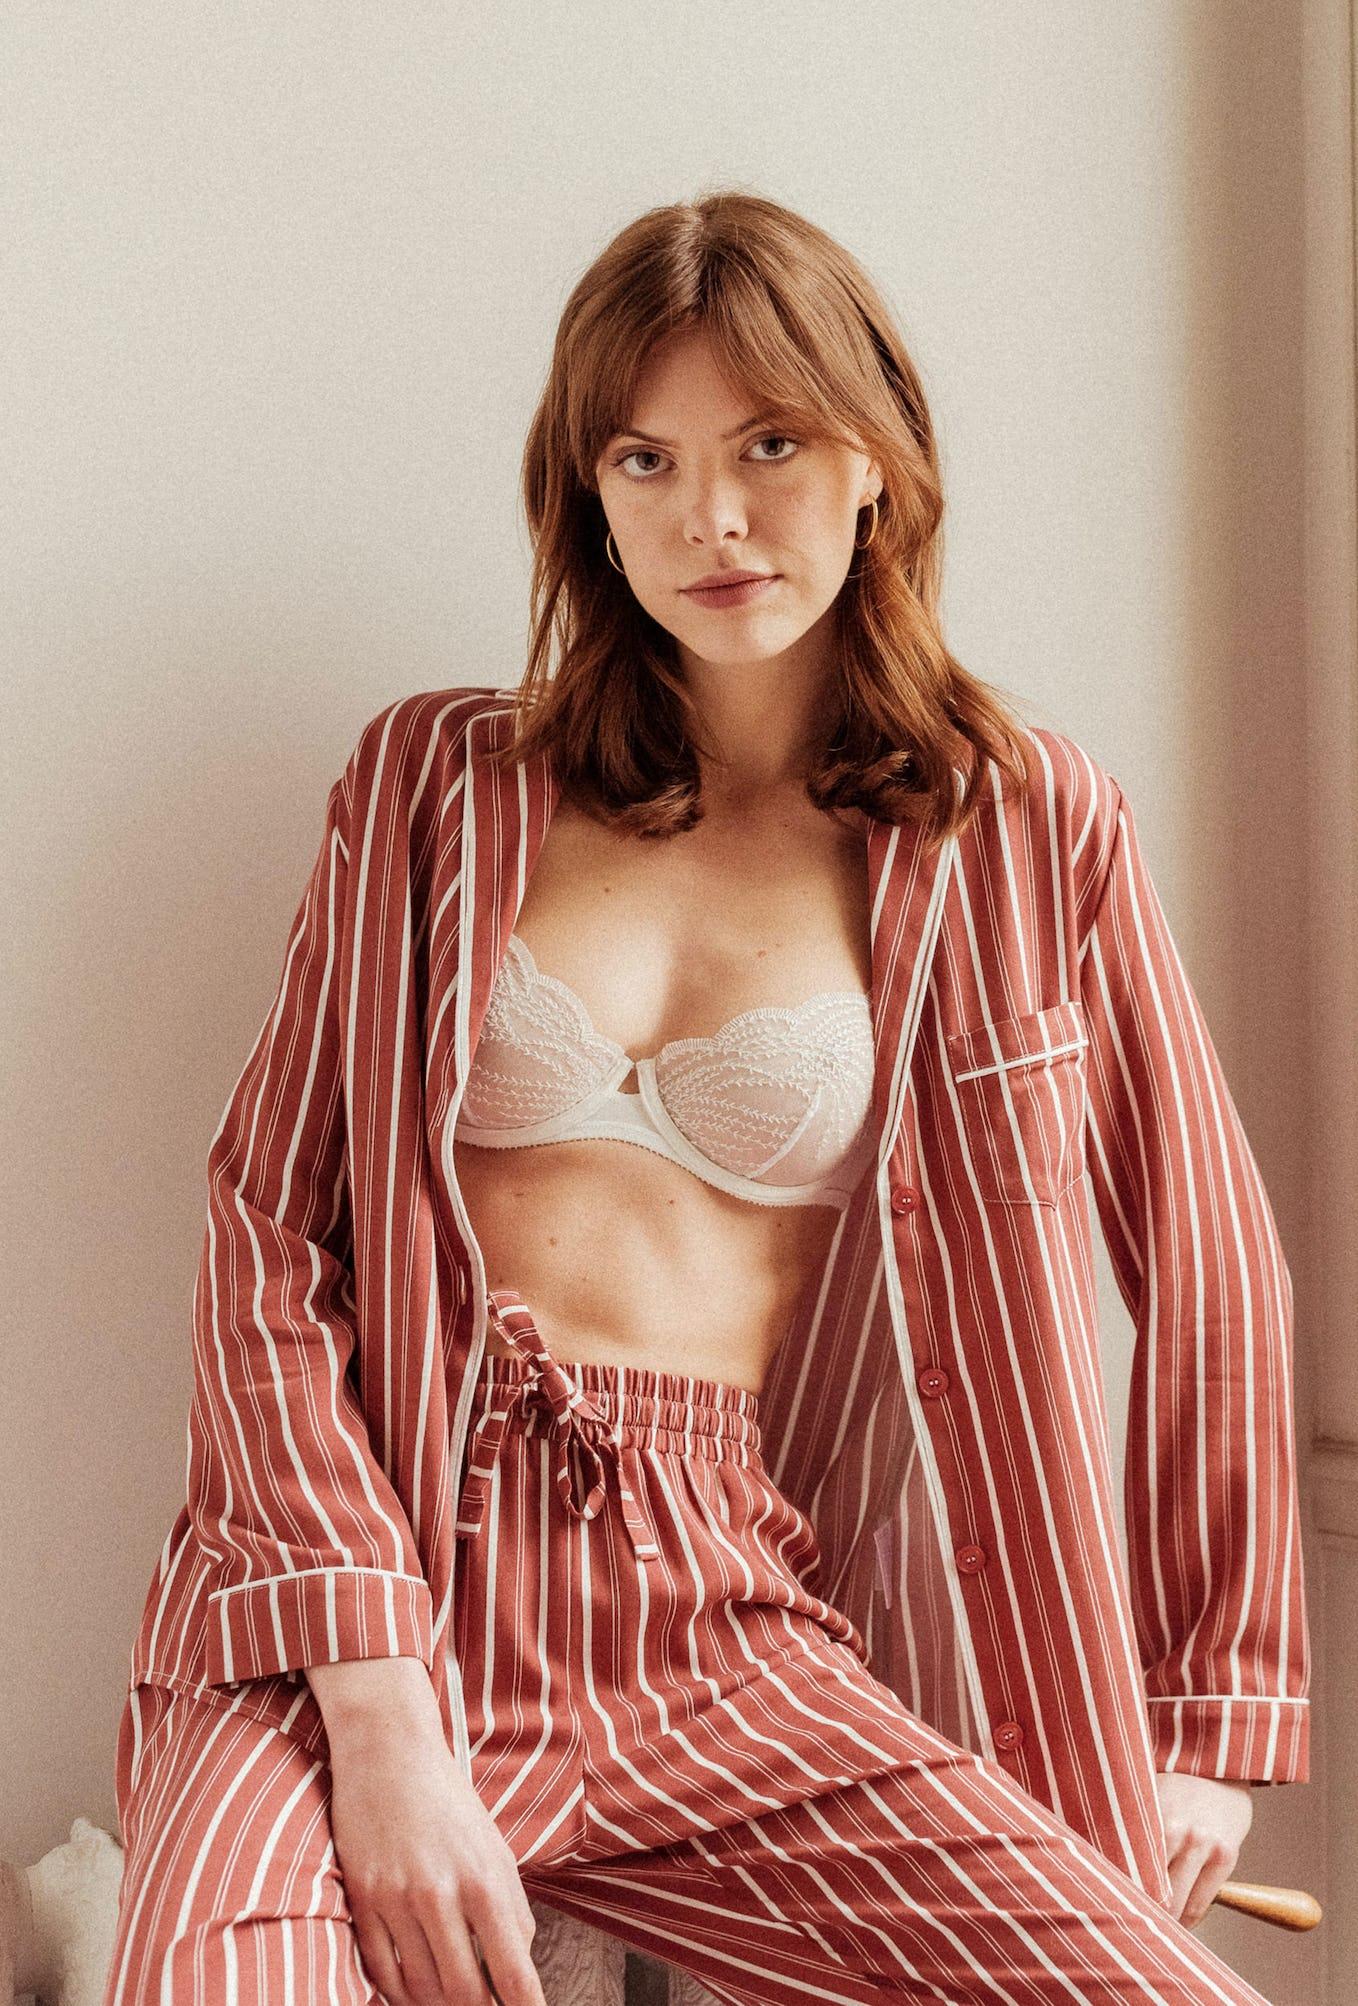 Homewear set with Chérie stripes Songe denuit shirt